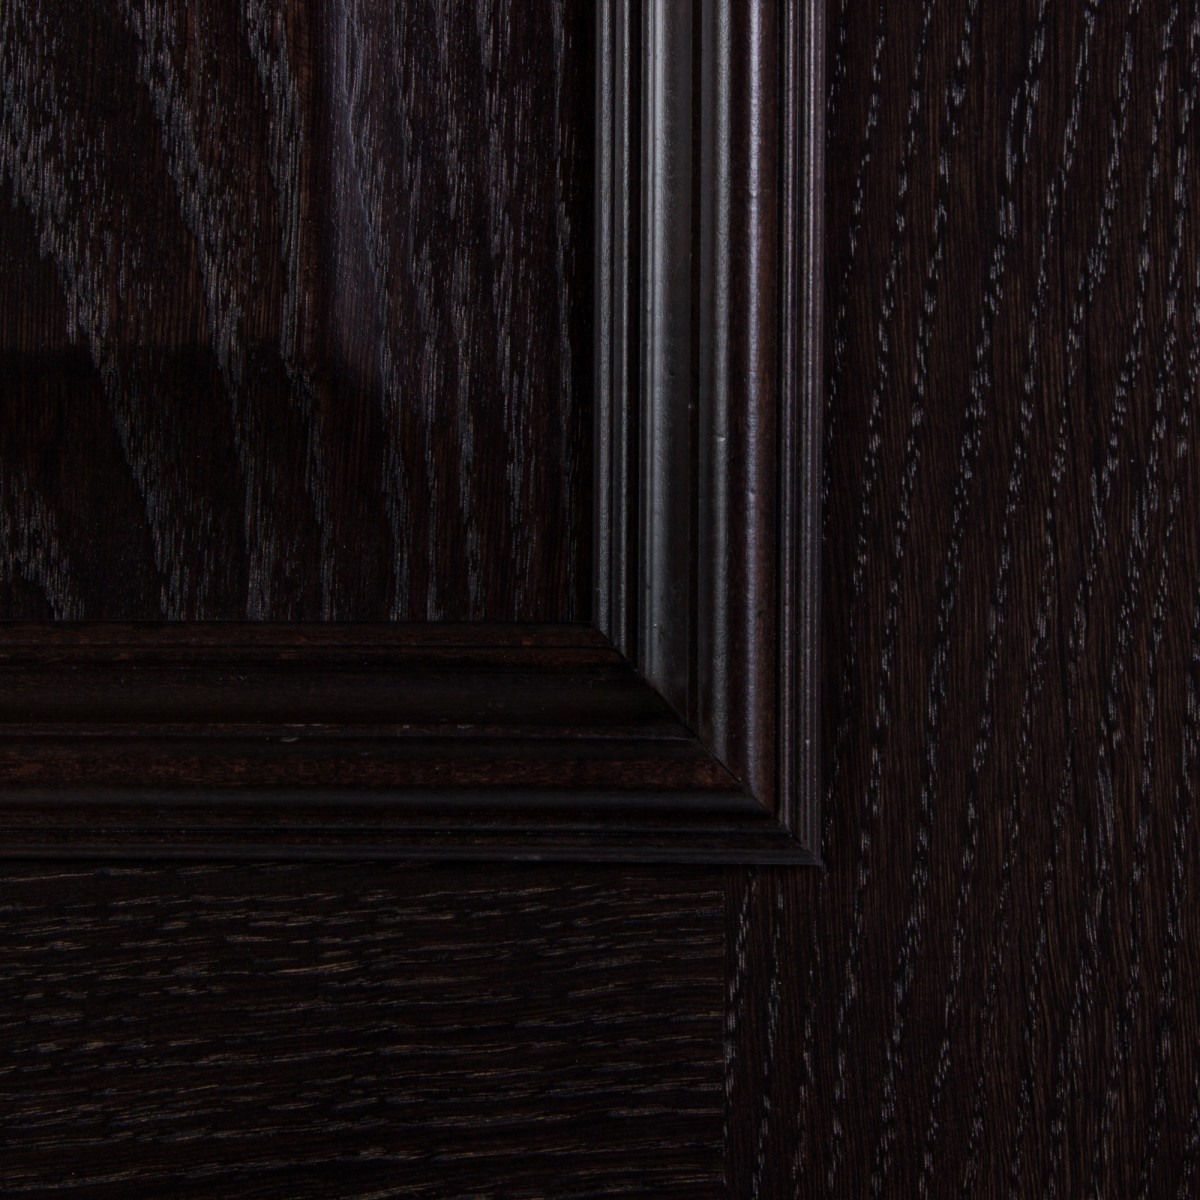 Дверь Межкомнатная Глухая Шпон Вельми 80x200 Цвет Венге